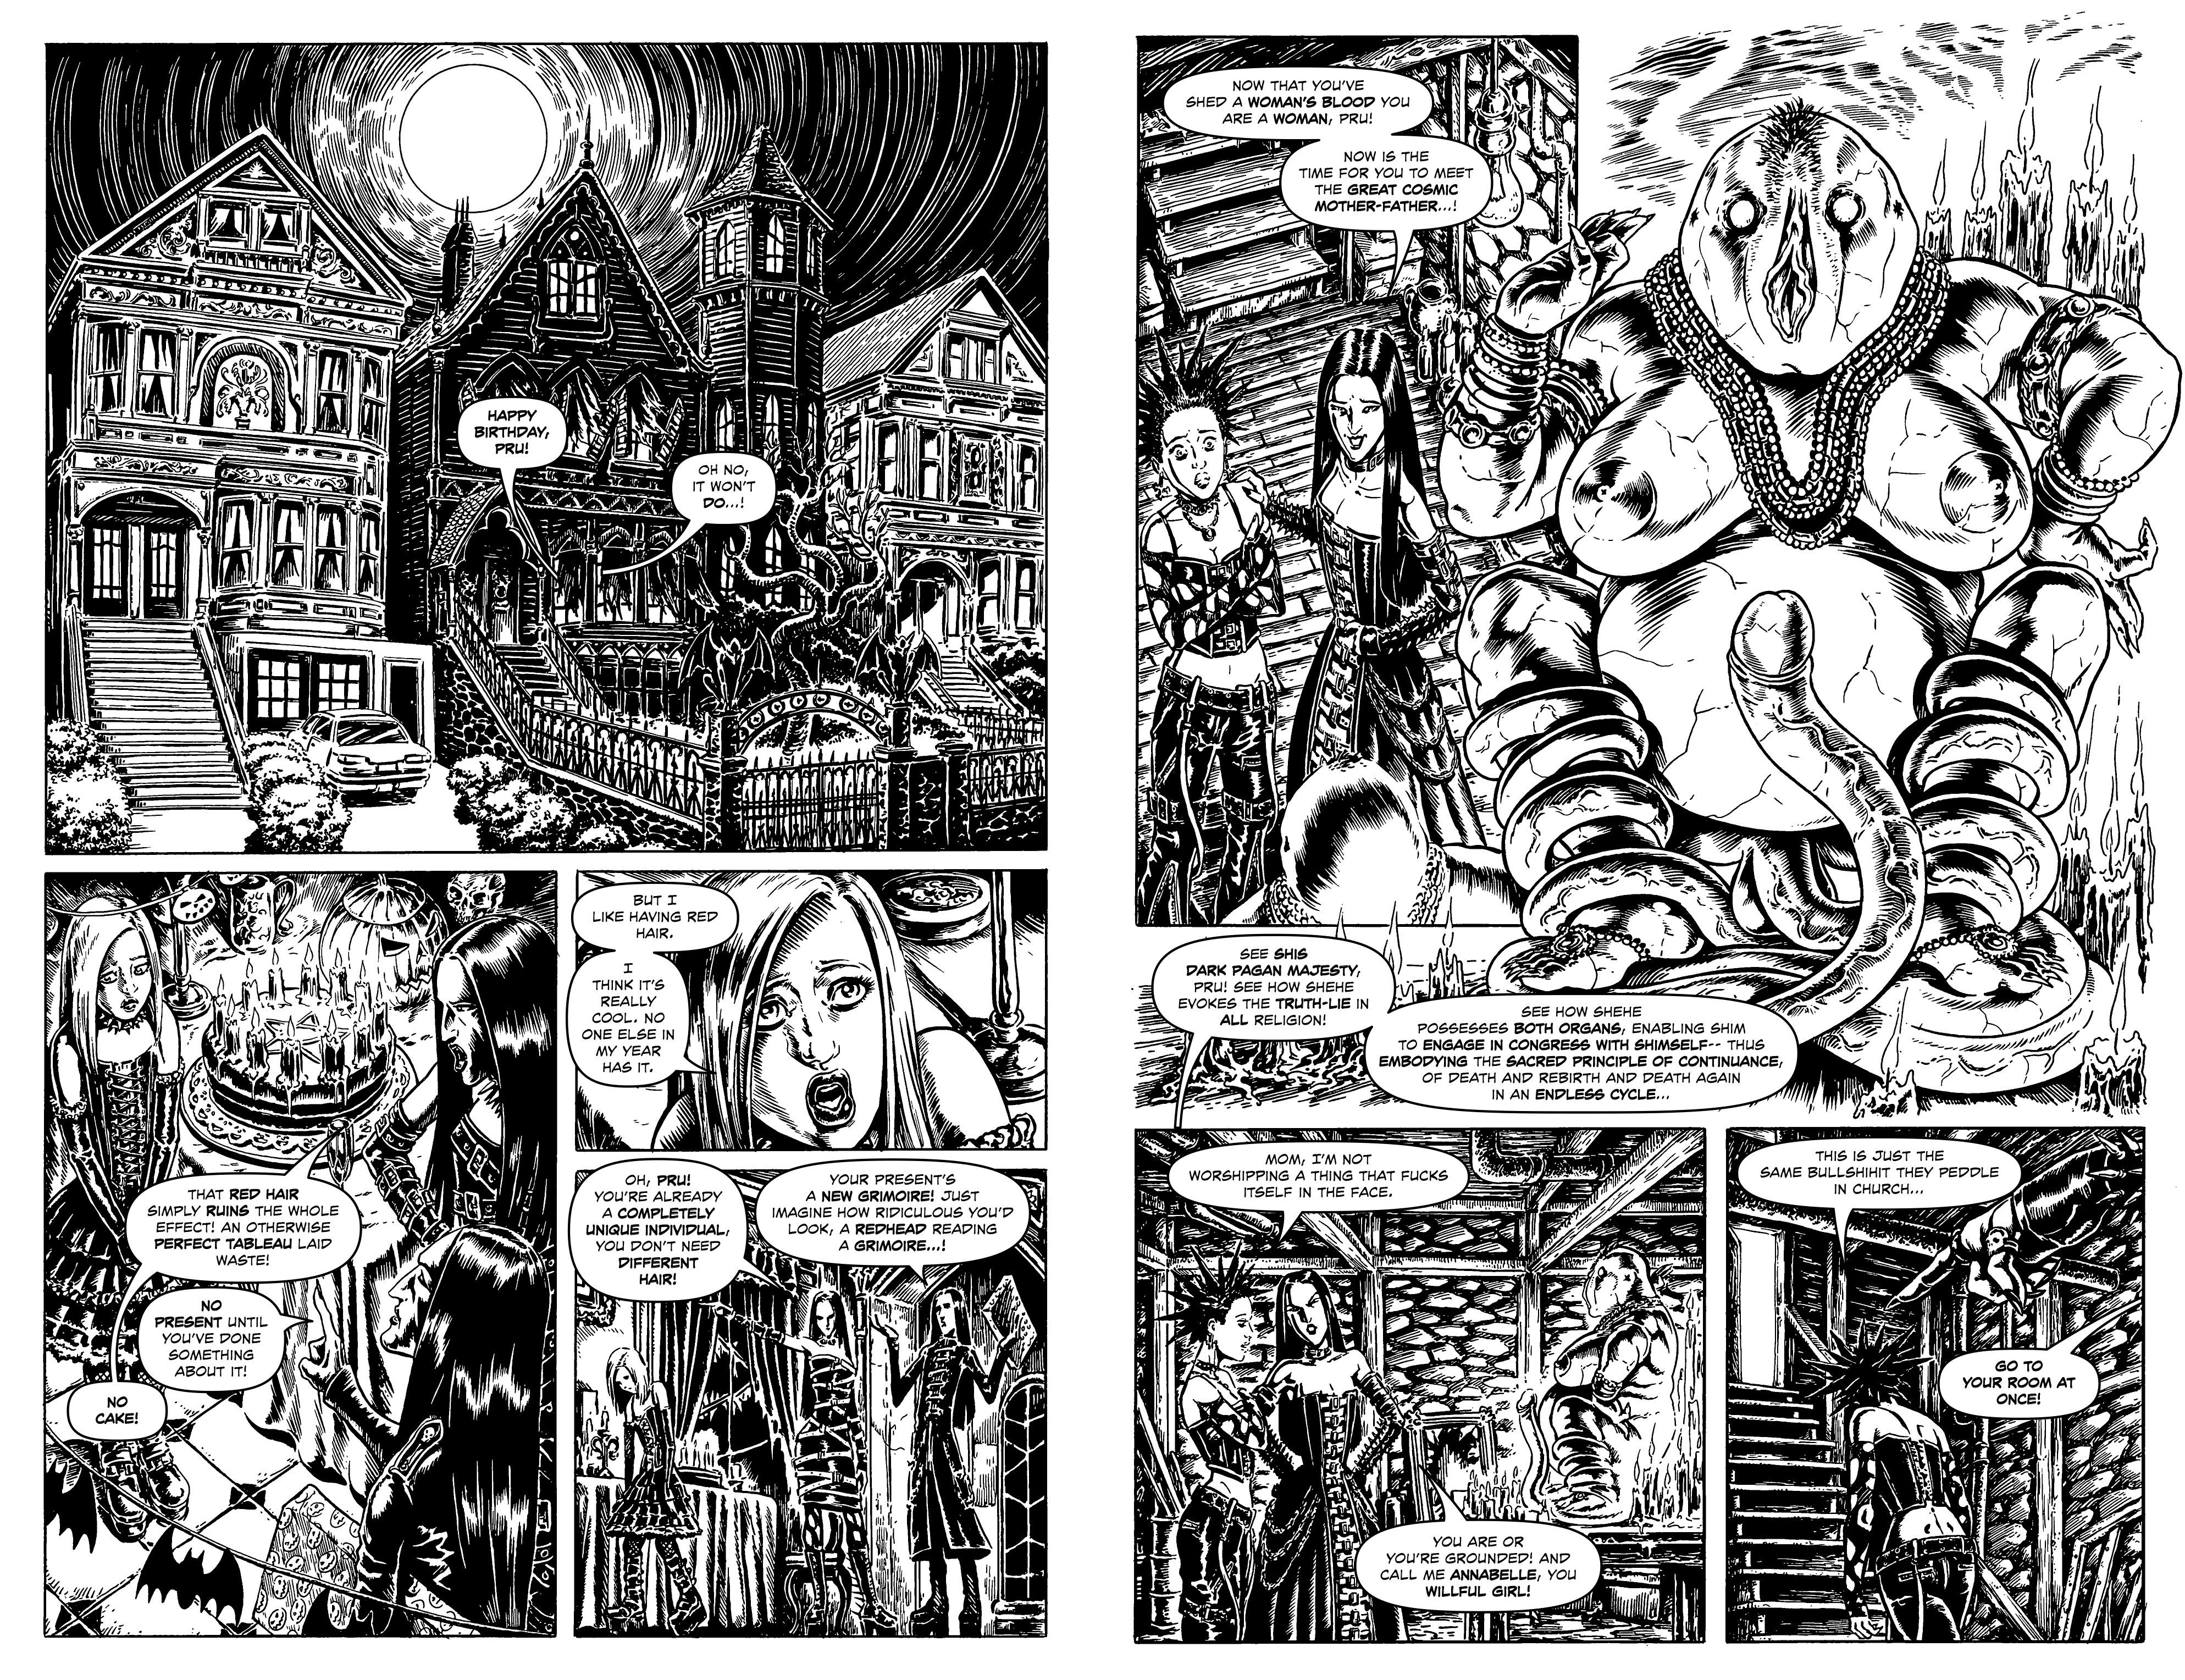 Read online Alan Moore's Cinema Purgatorio comic -  Issue #10 - 13